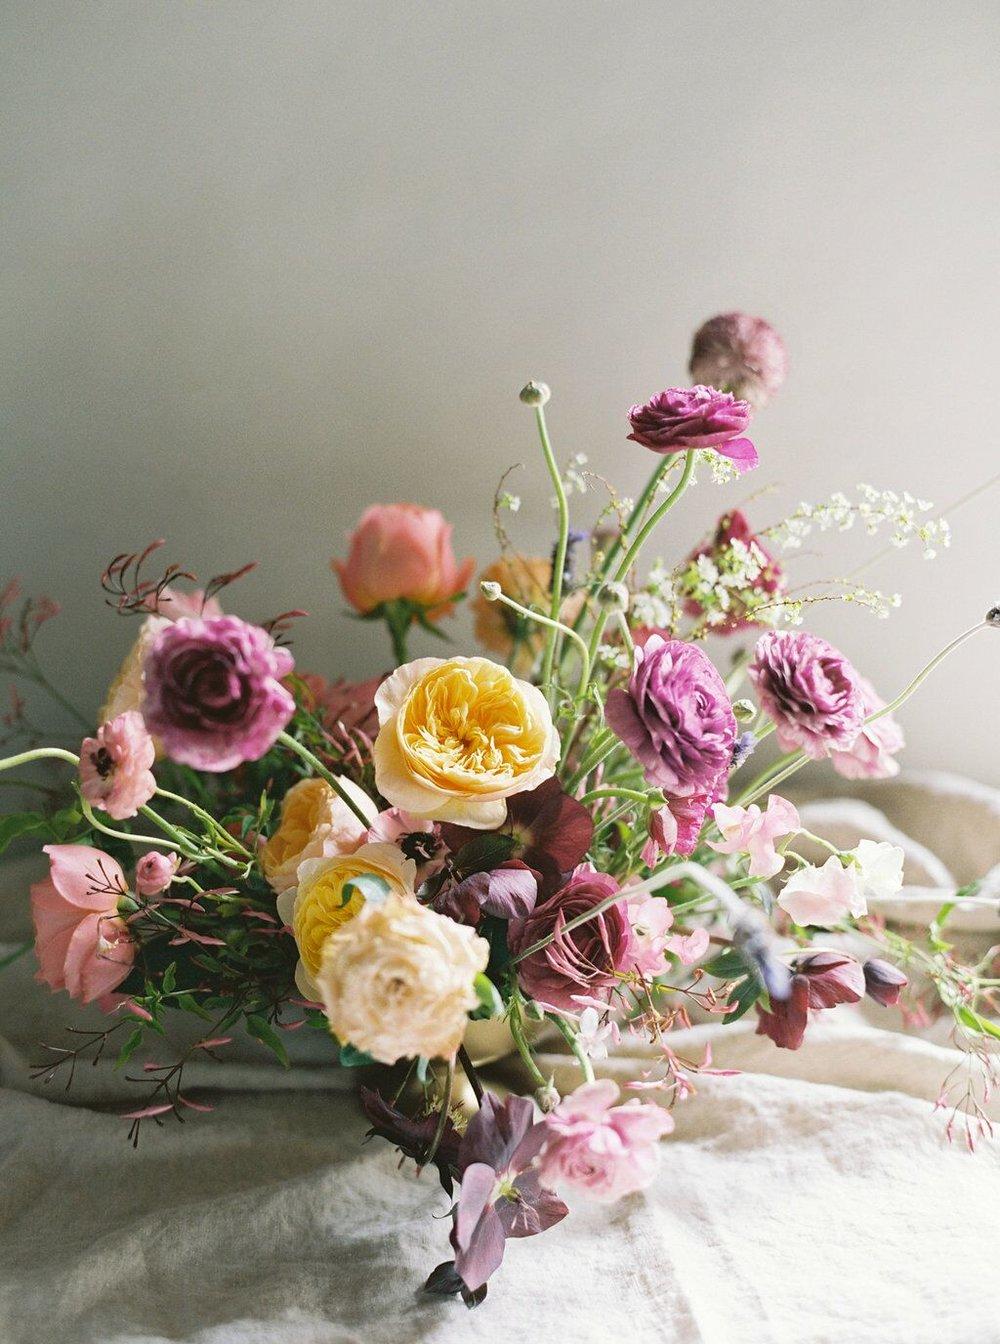 trynhphoto-sandiego-socal-florist-siren-floral-workshop-11_preview.jpg